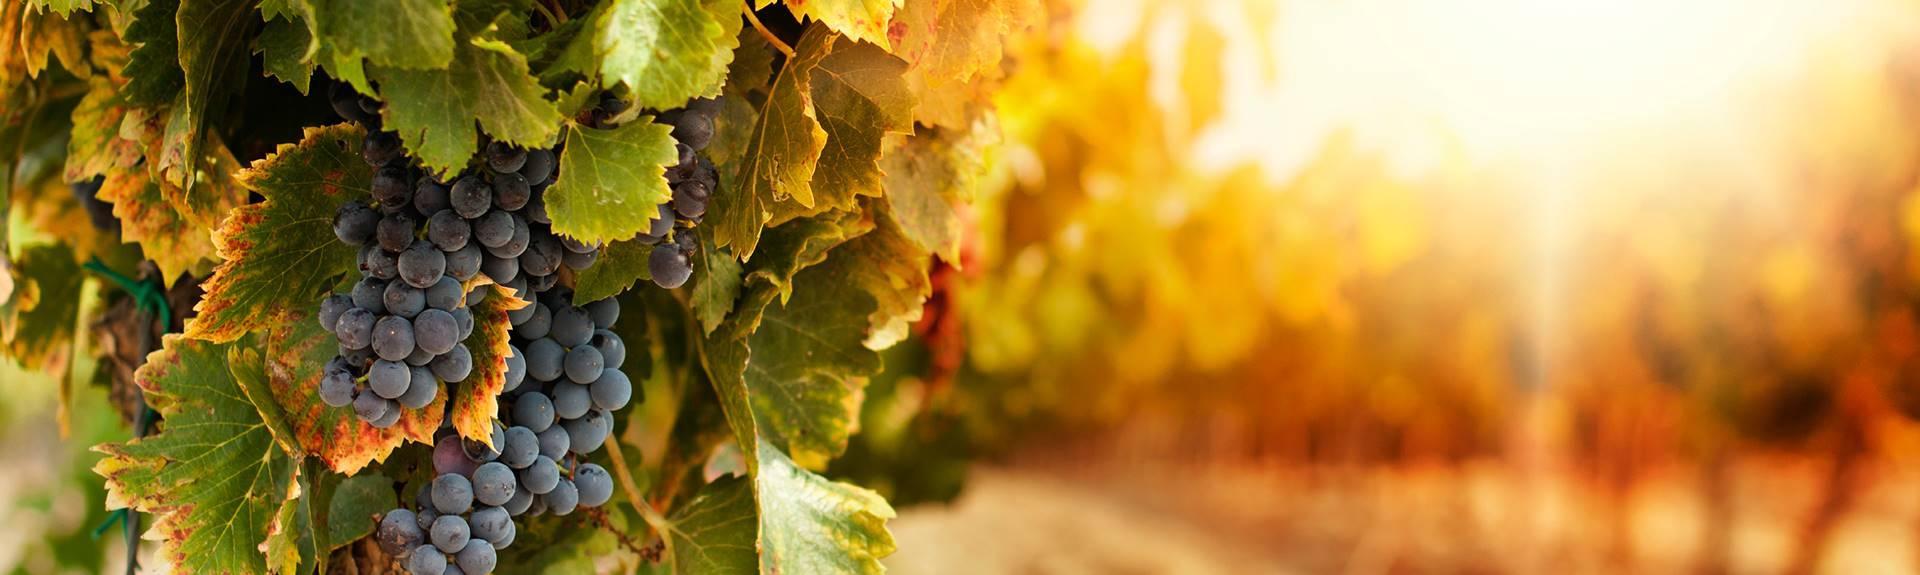 fall - grape vines